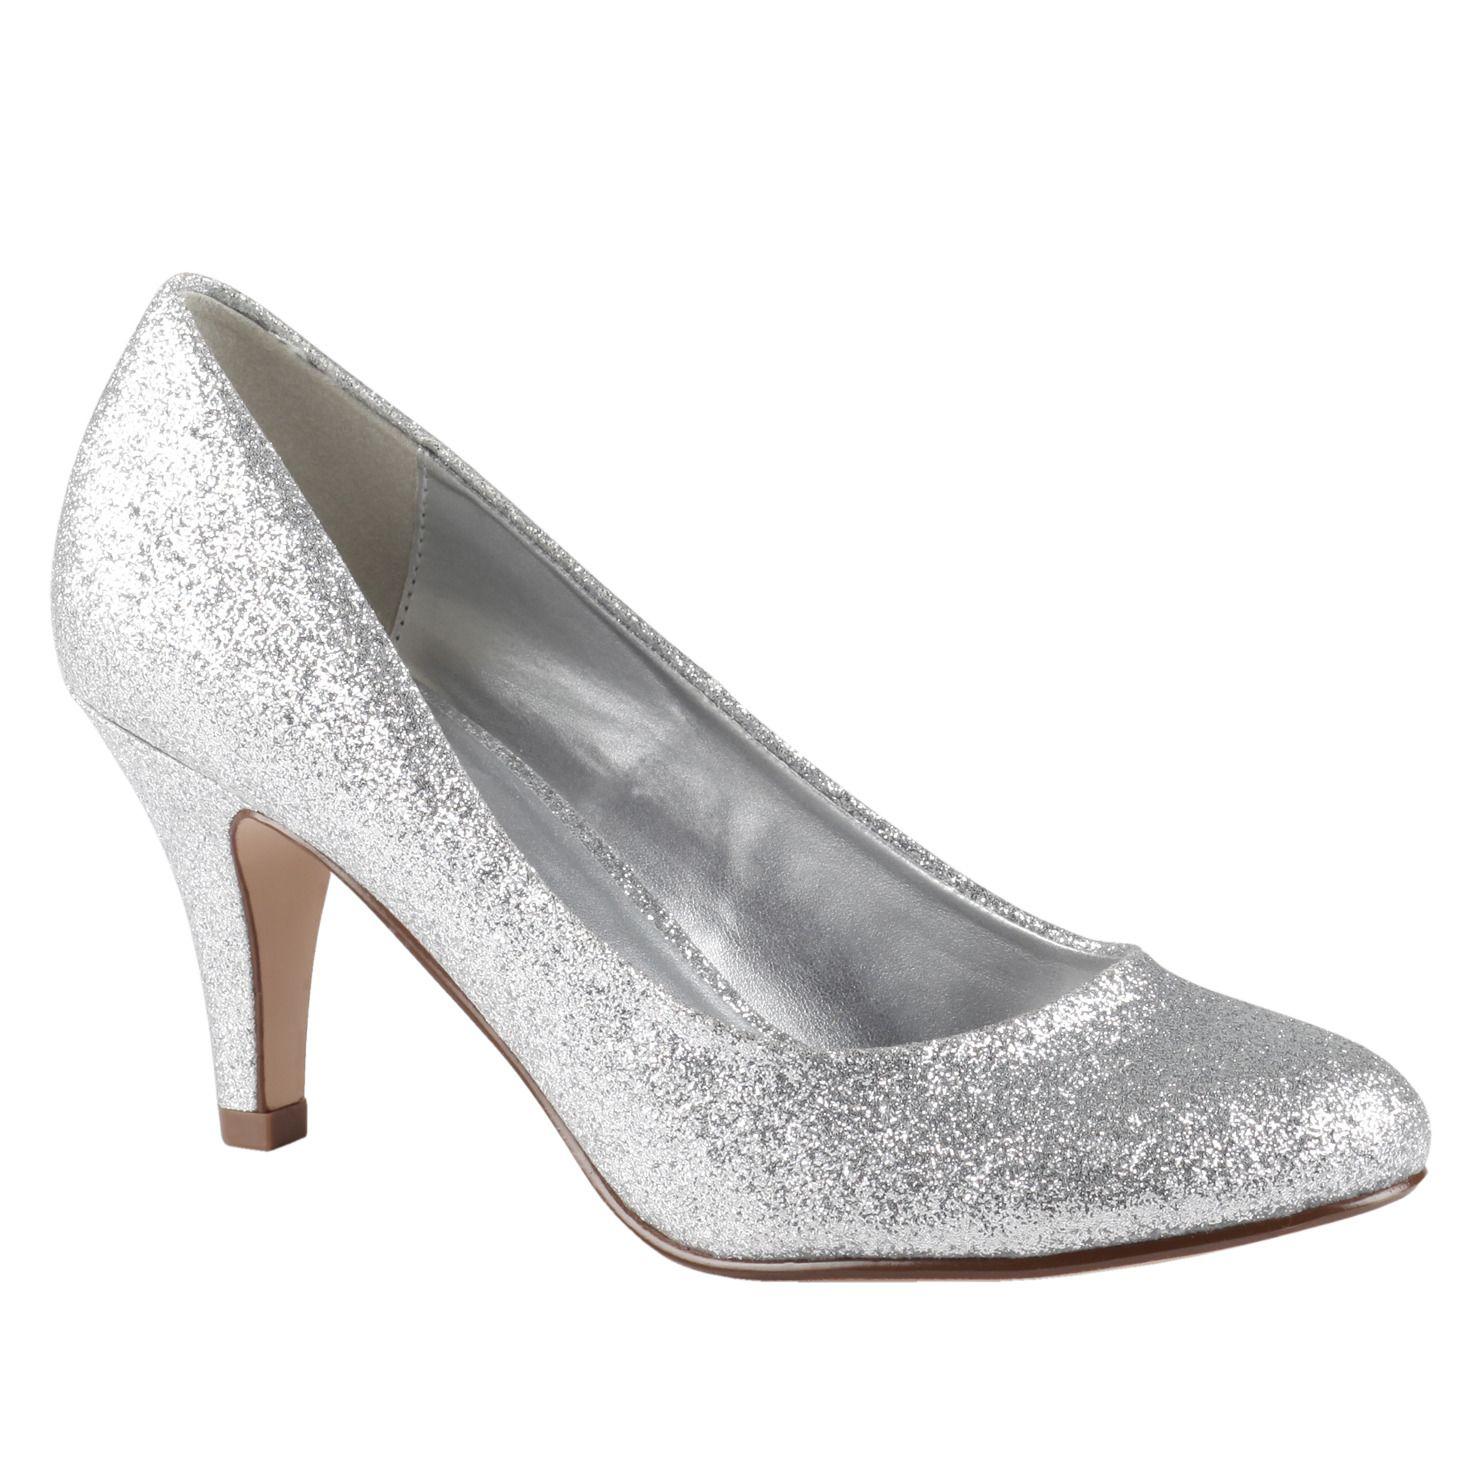 Vegan shoes, Glitter pumps